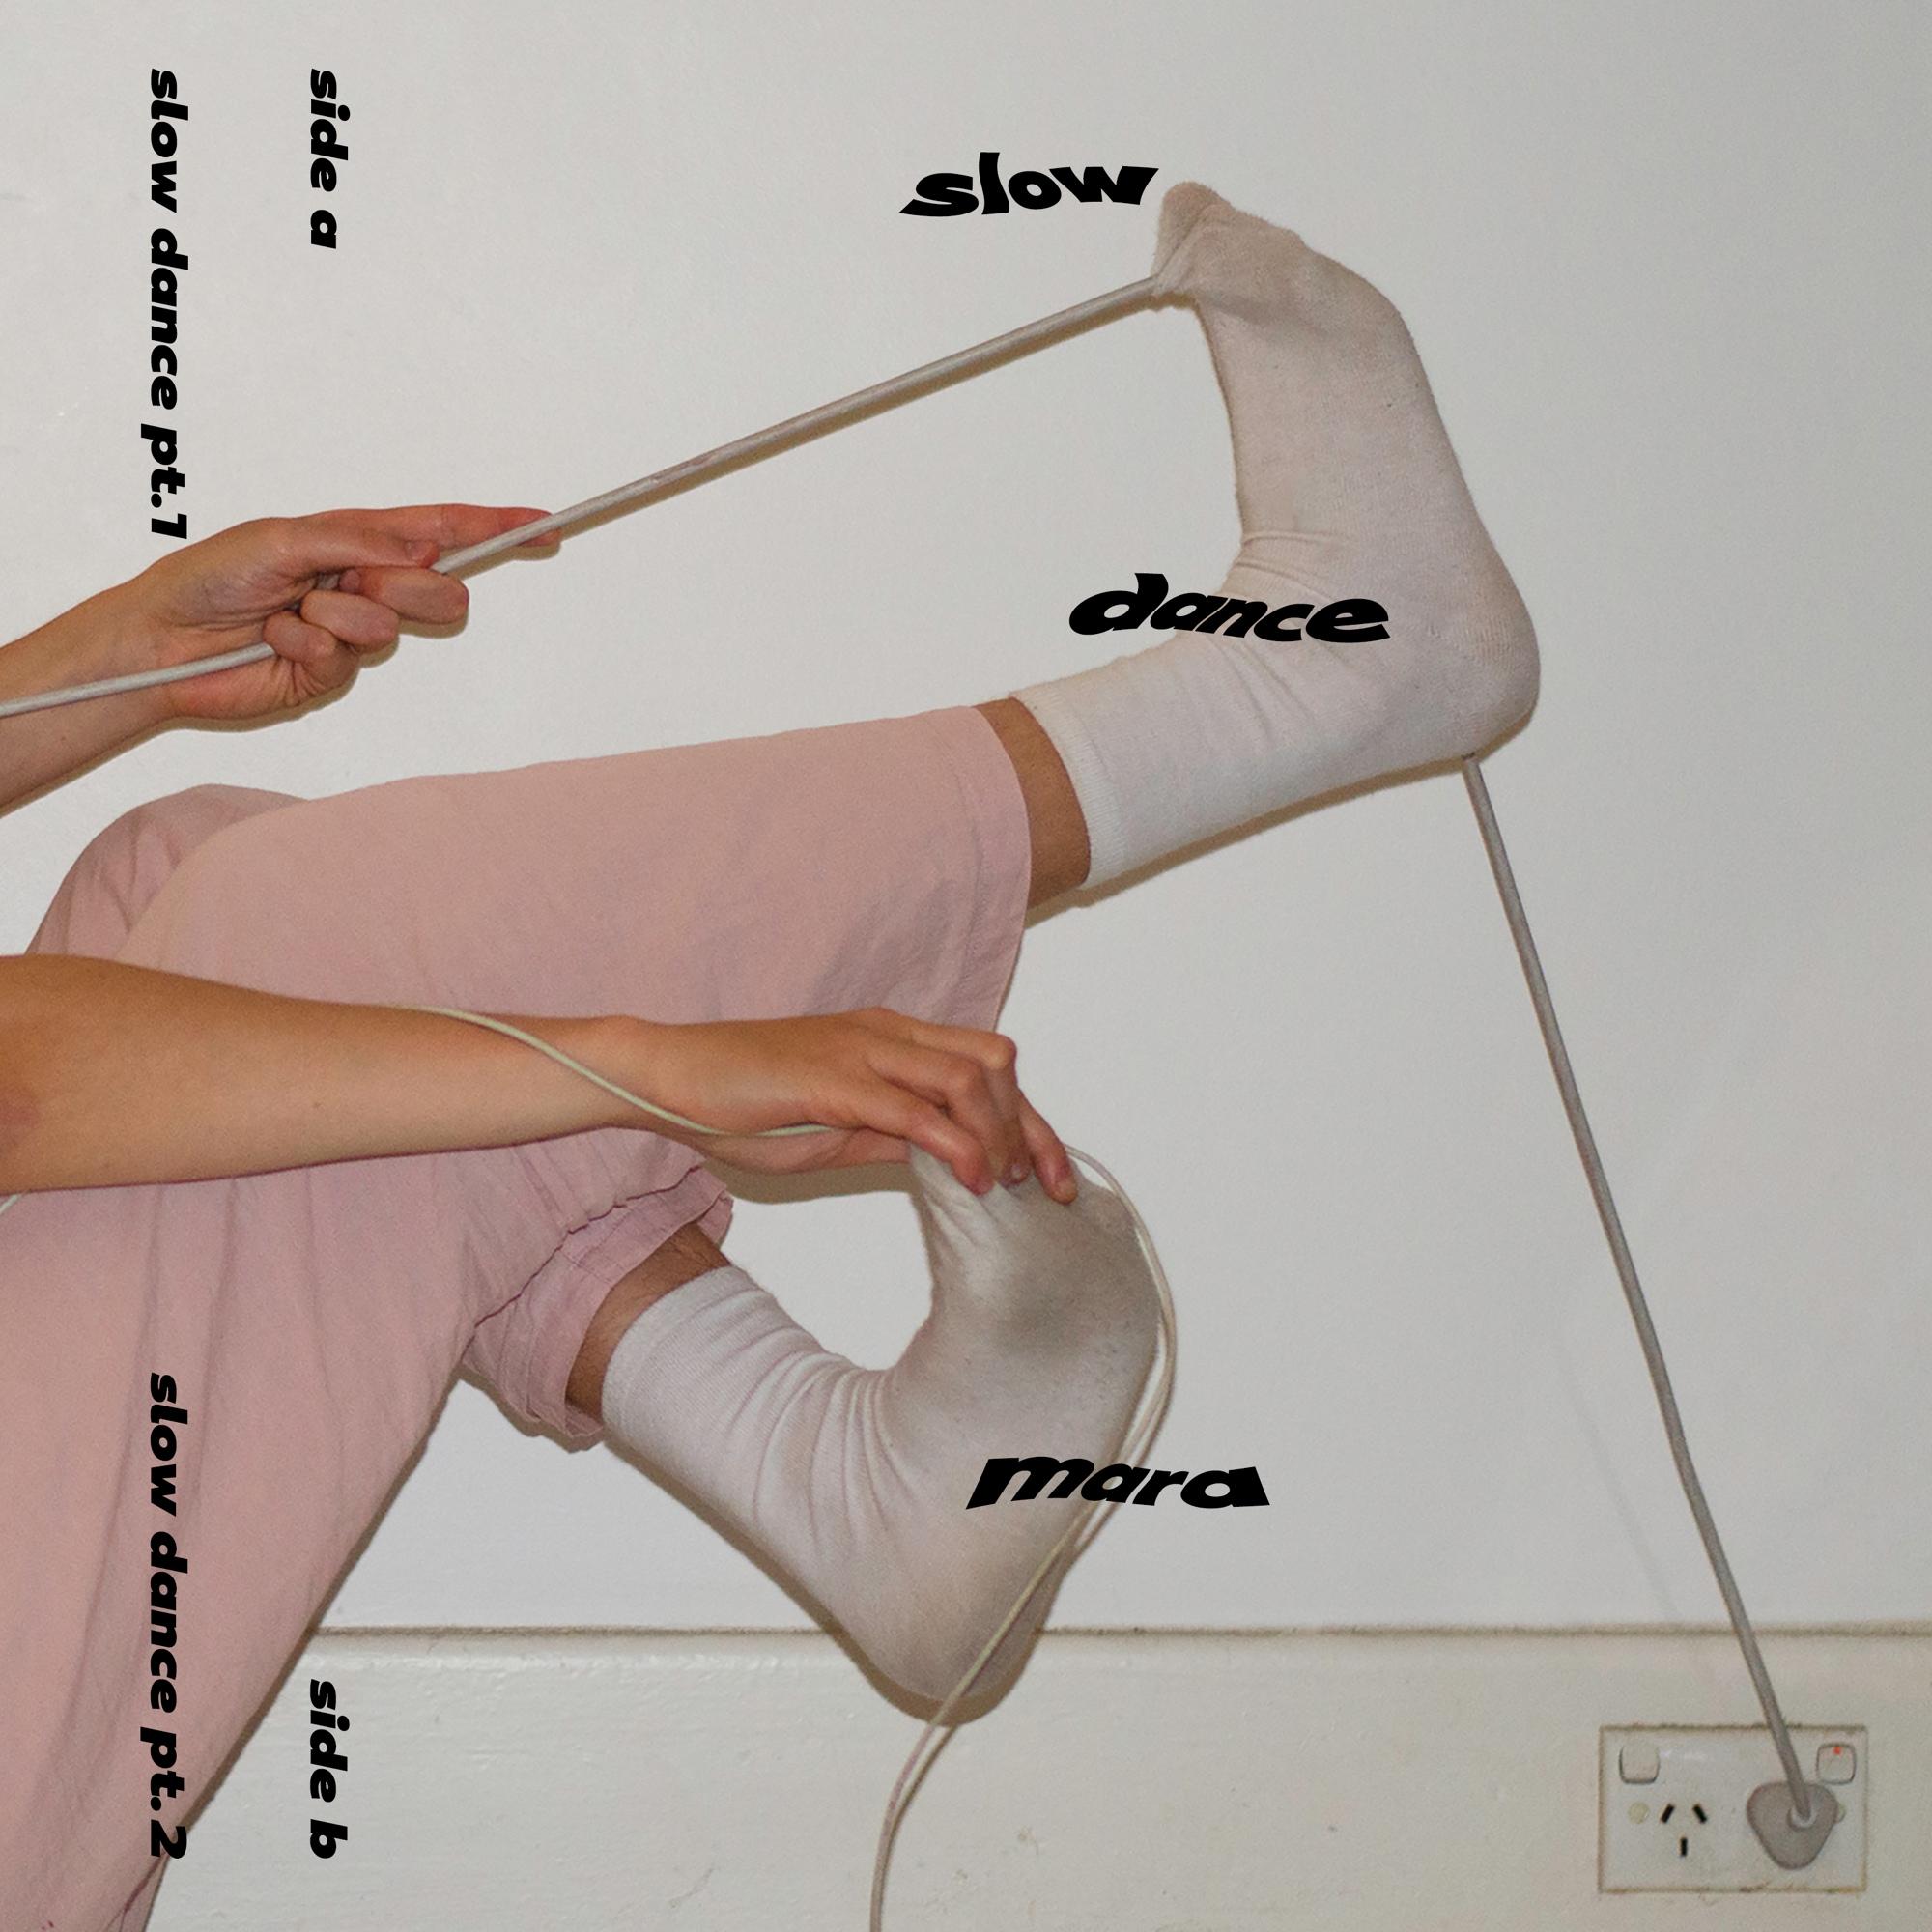 mara - slow dance [Club Moss 007]